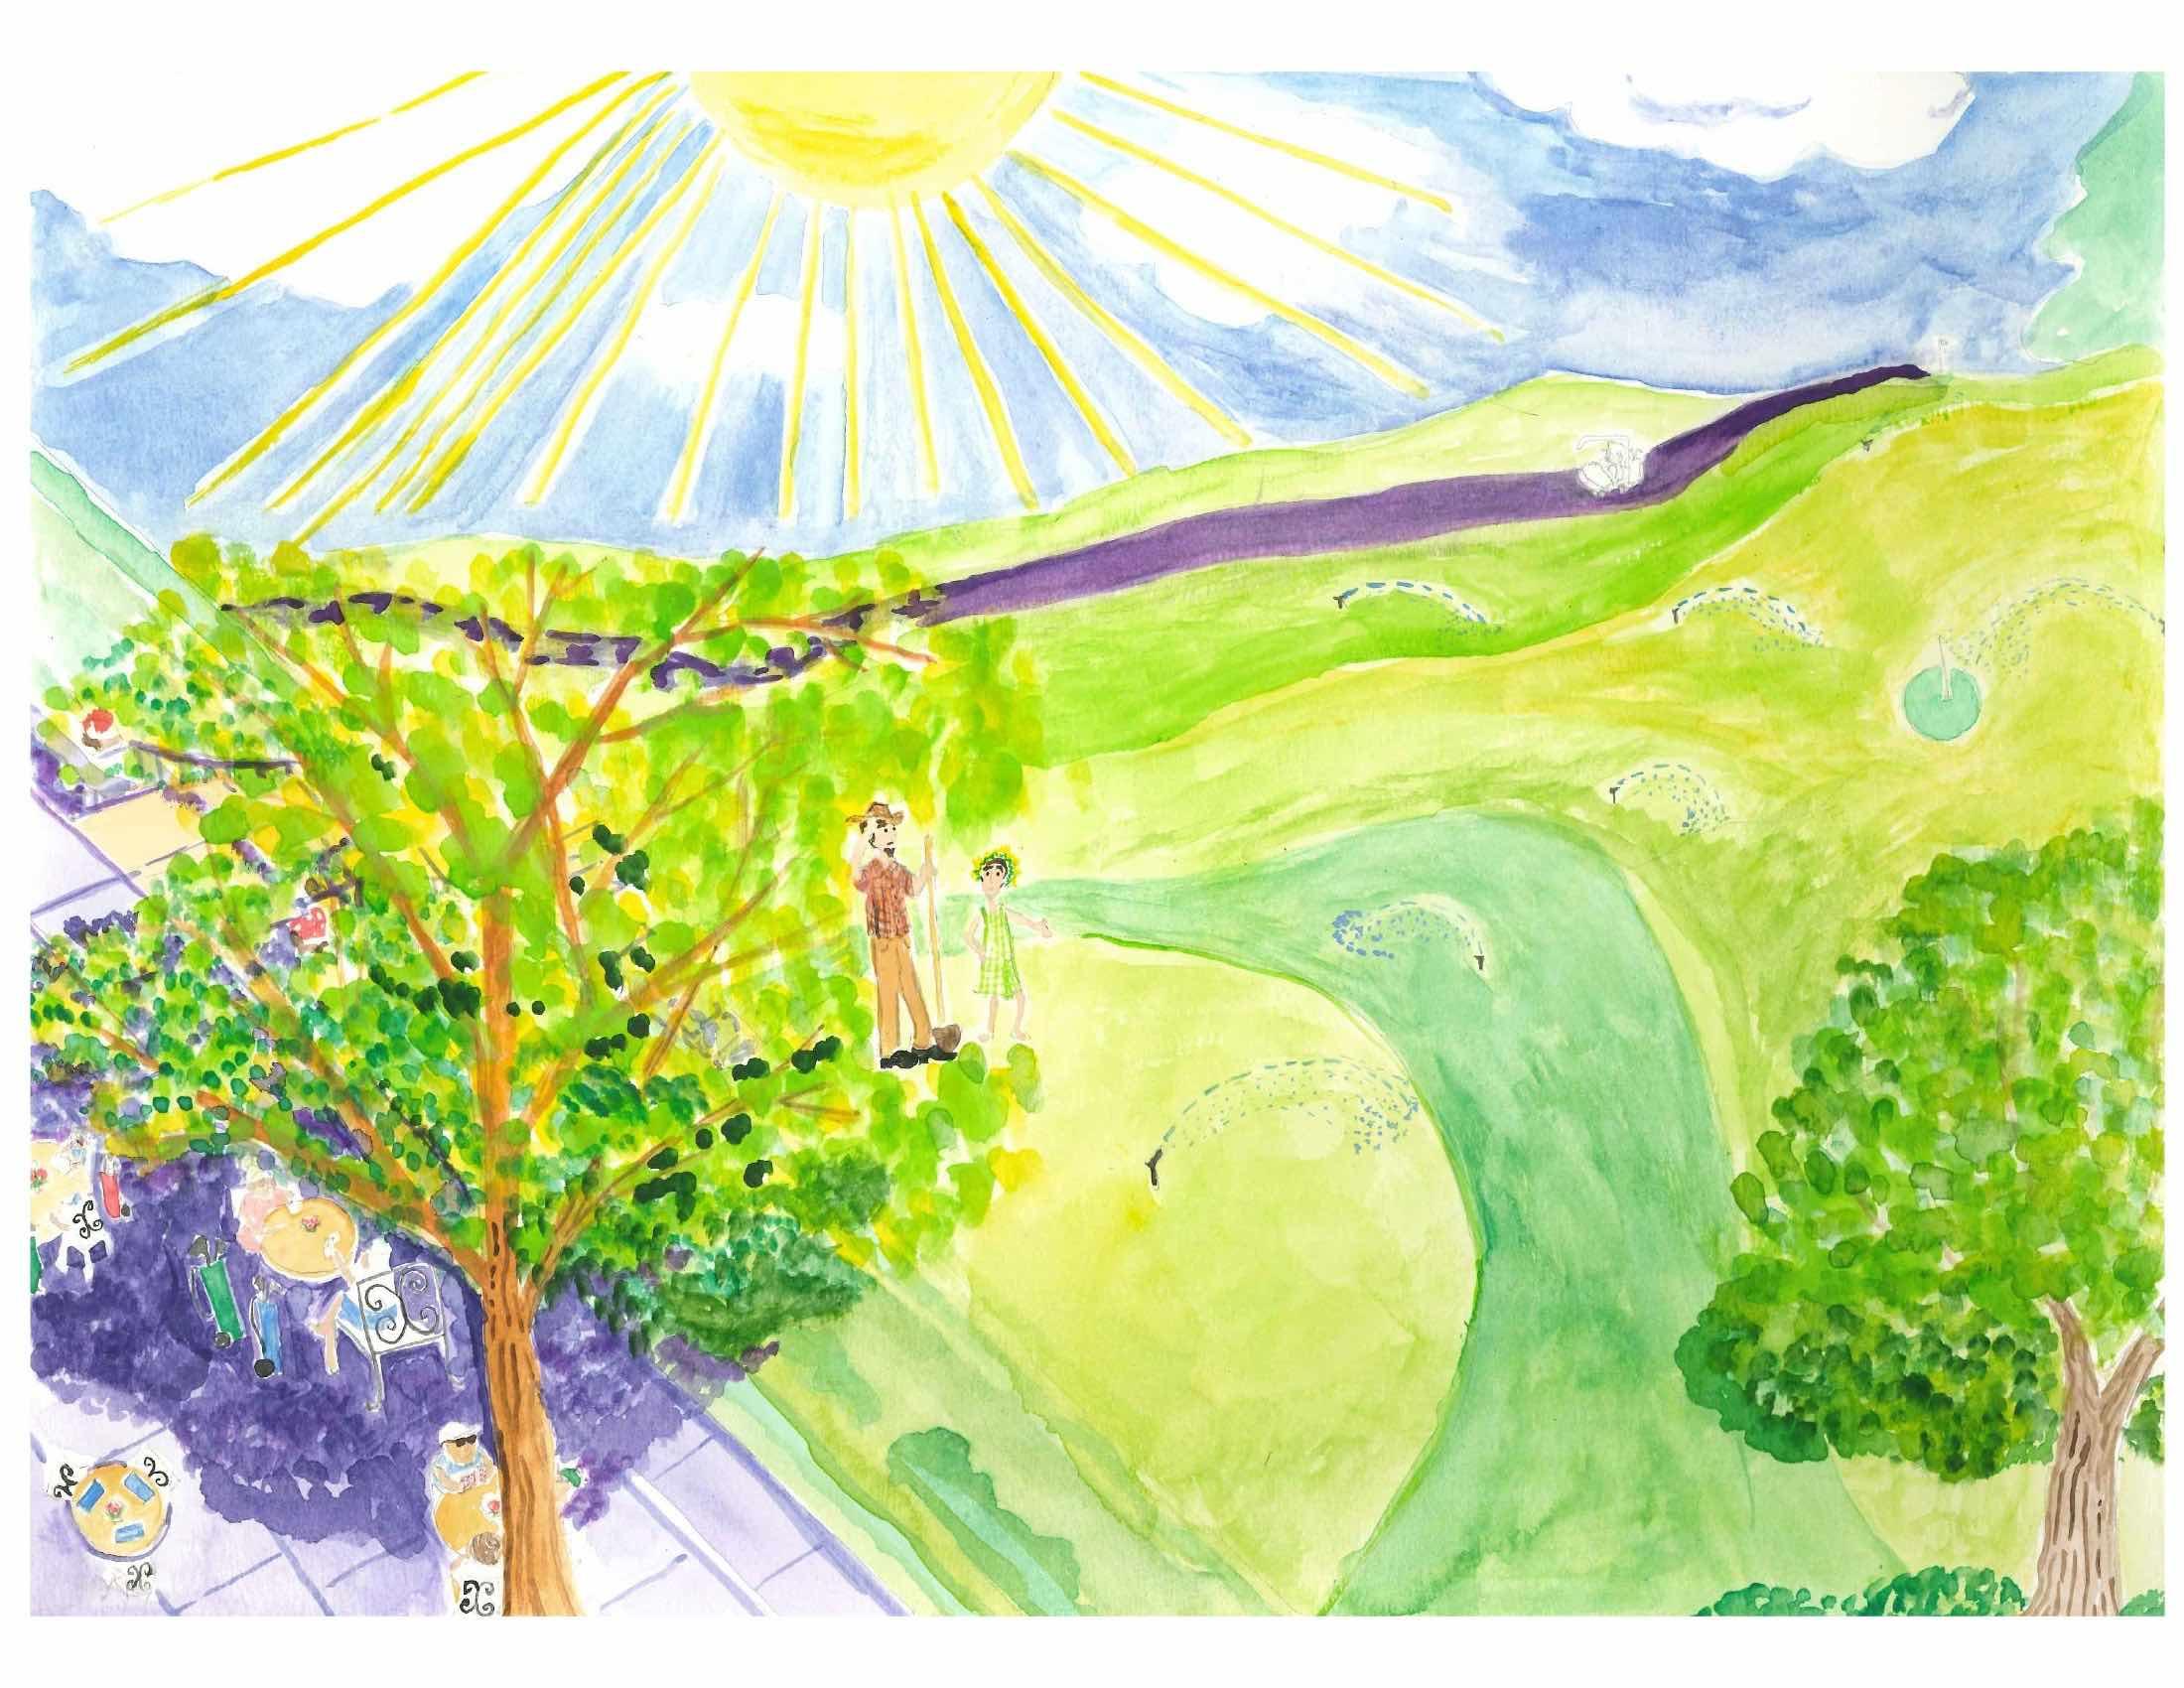 Green Queen golf course